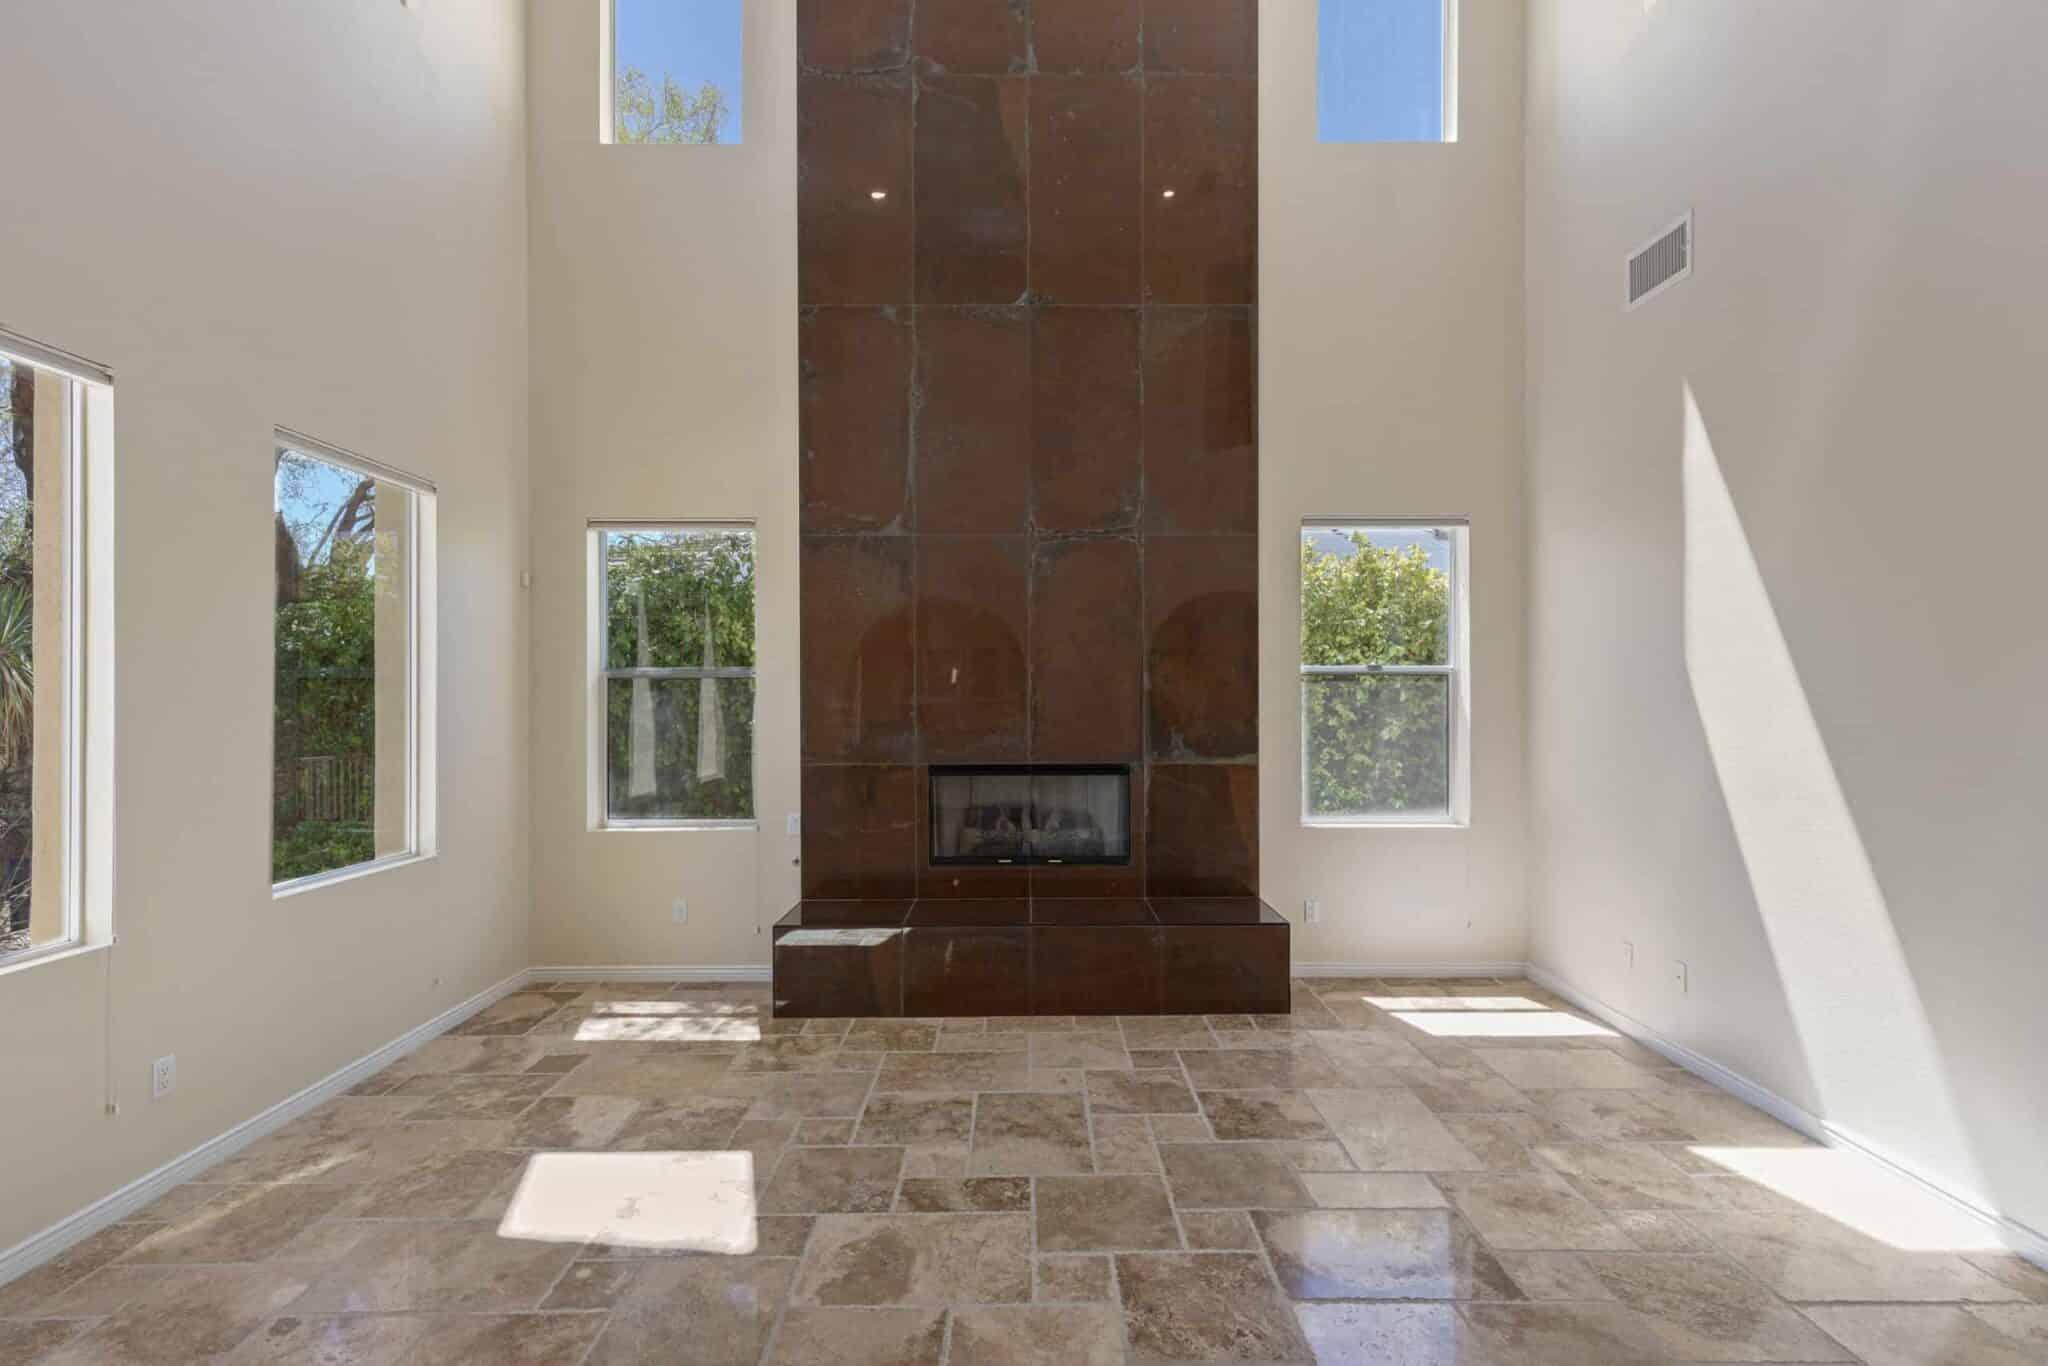 las-vegas-luxry-real-estate-realtor-rob-jensen-company-2620-grassy-spring-place-rrcc10